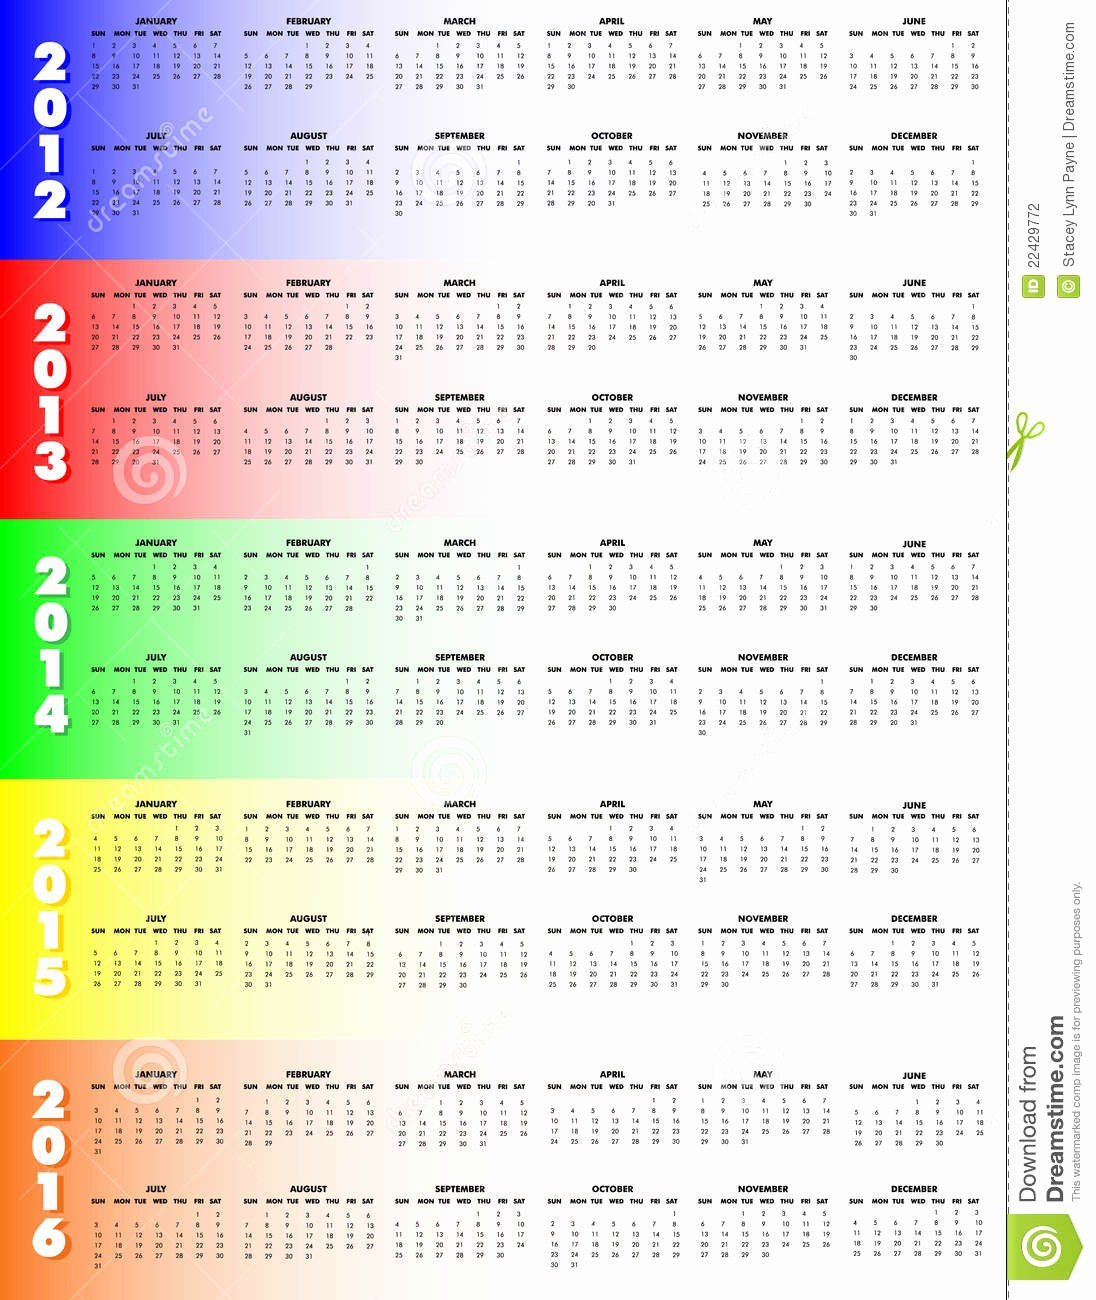 5 Year Calendar Starting 2016 New Five Year Calendar 2012 2016 Sunday Start Stock